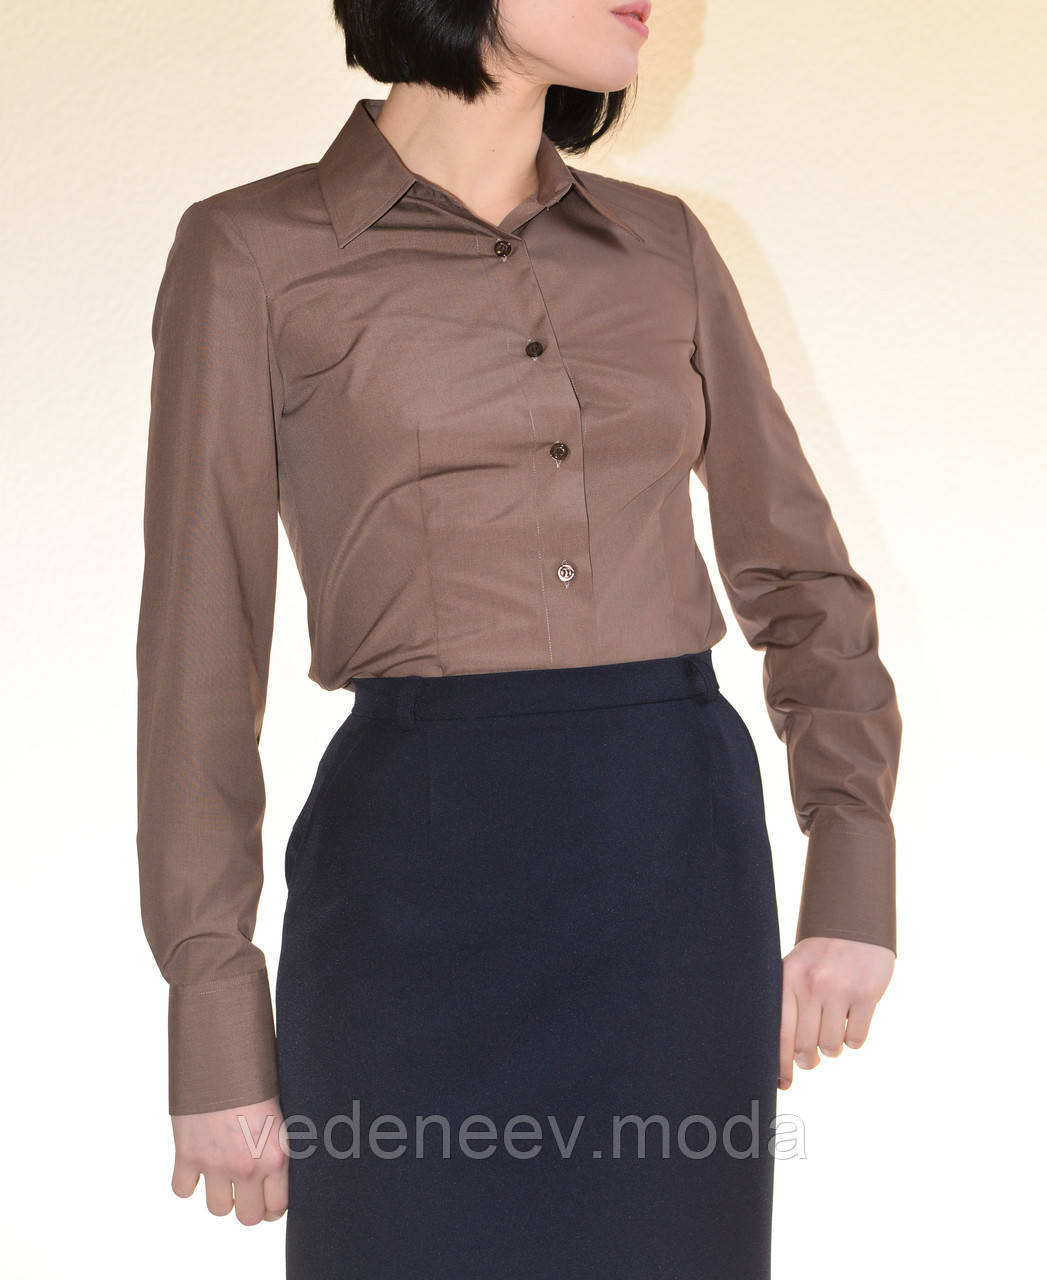 Блуза кофейного цвета